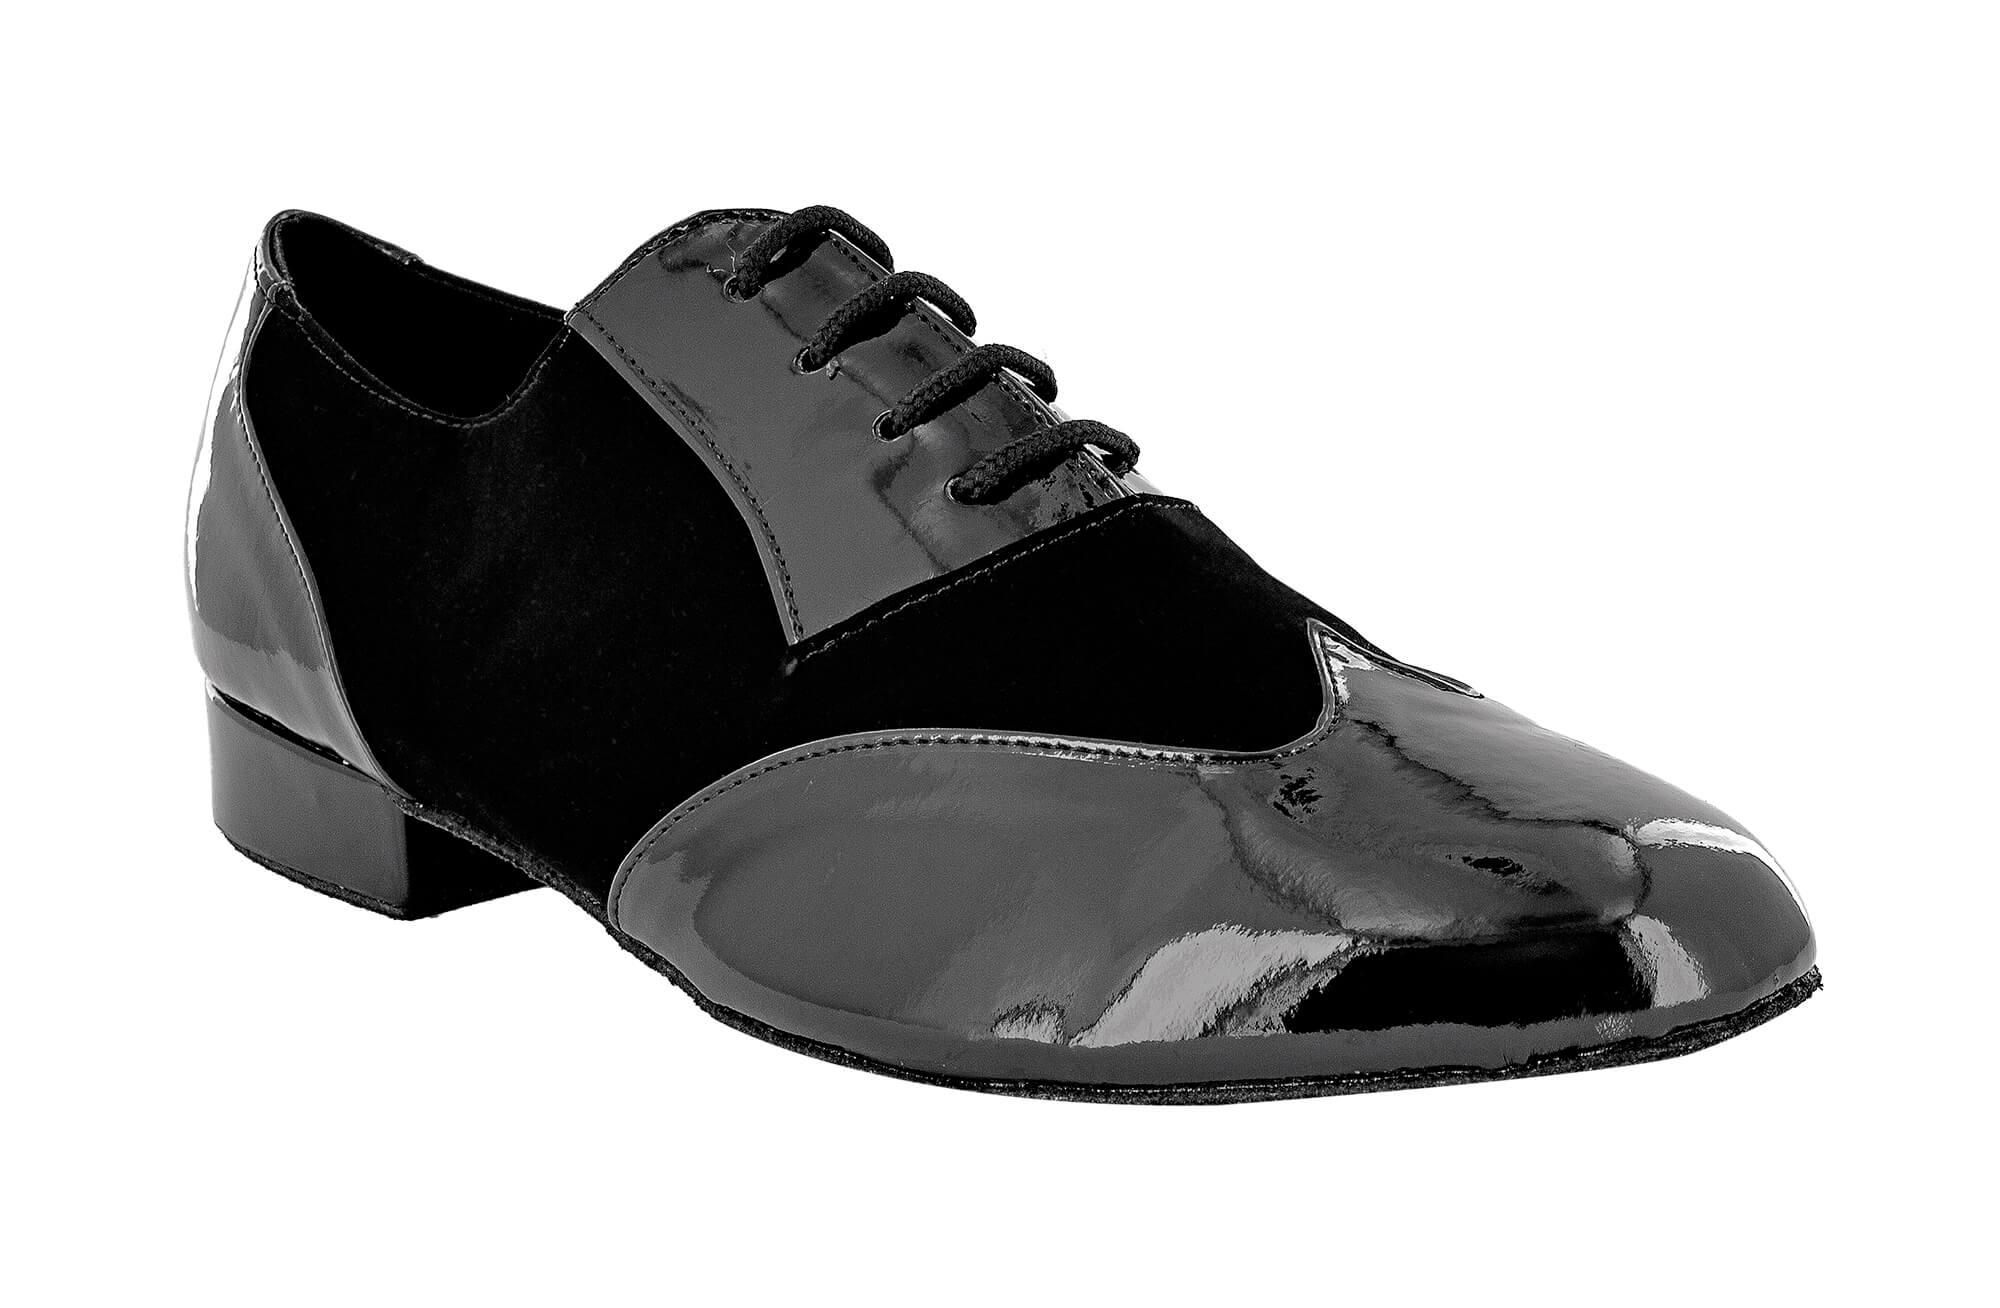 buy popular ceaf2 16cab Dancing shoes for men in paint and nabuk black sole comfort heel 2,5 cm -  Dancin scarpe da ballo